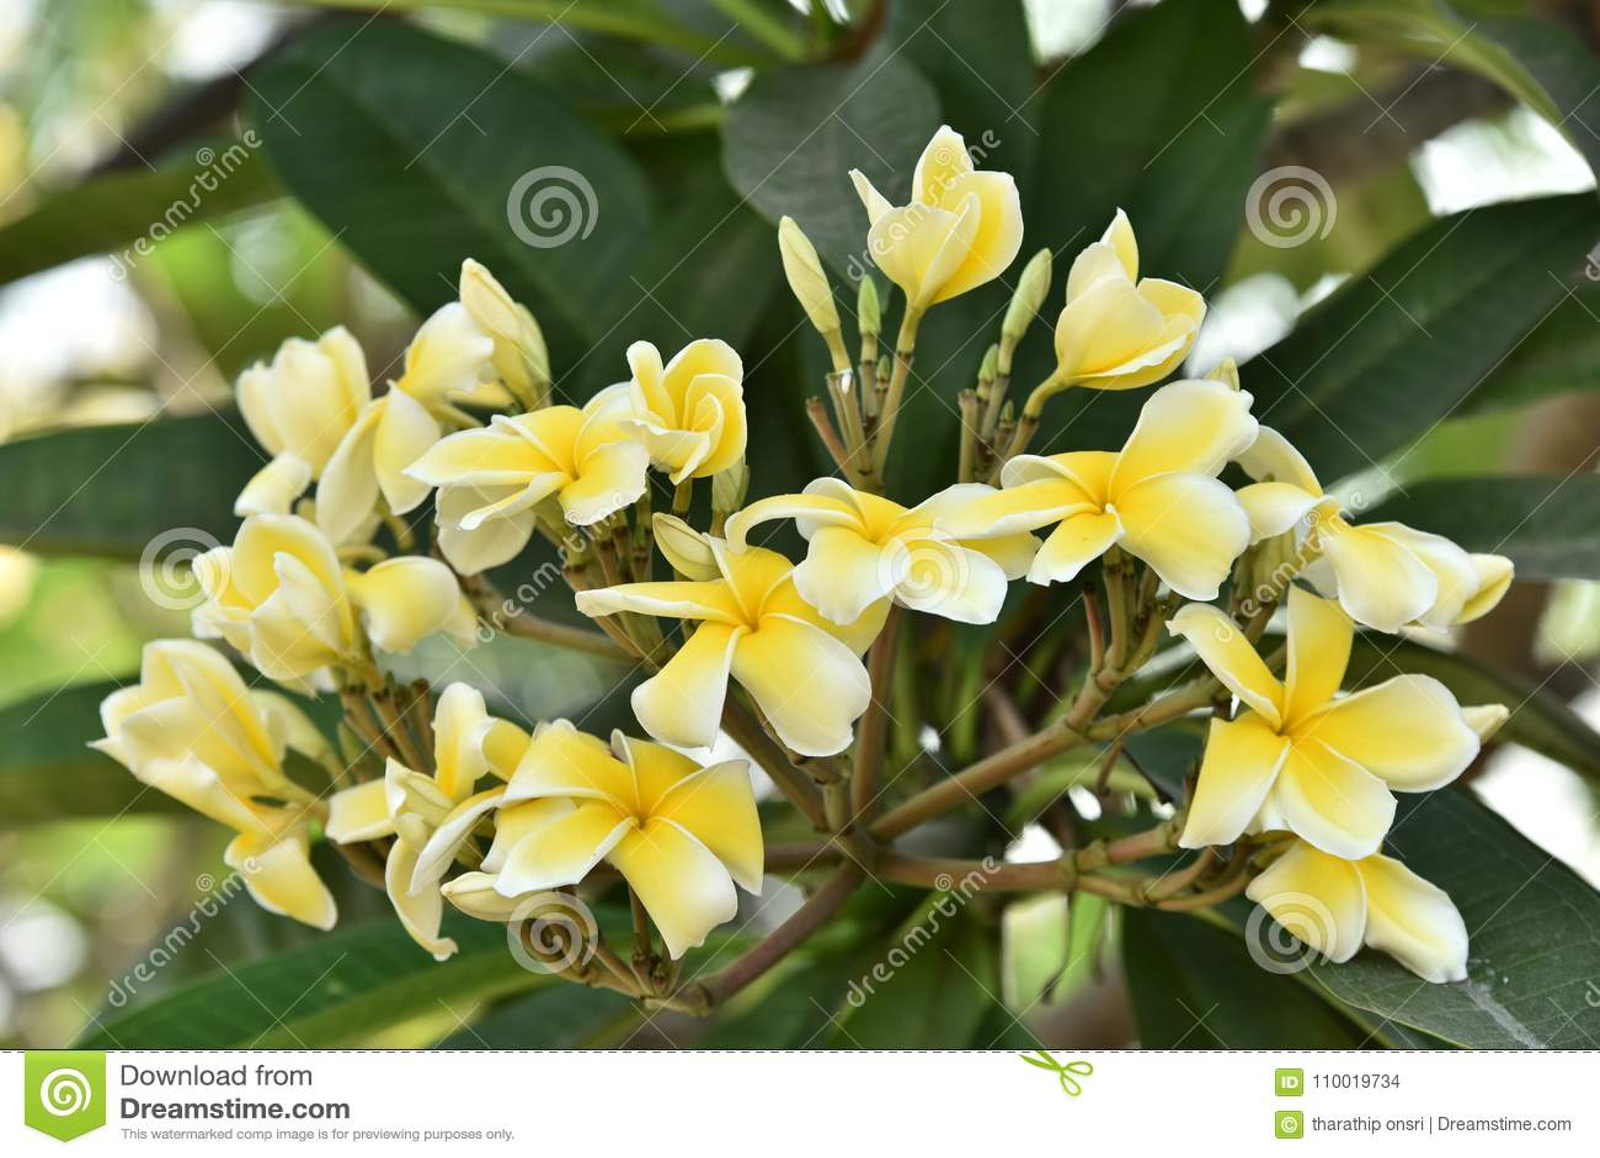 Spring background with beautiful yellow flowersllow flowers on a download spring background with beautiful yellow flowersllow flowers on a green background stock photo mightylinksfo